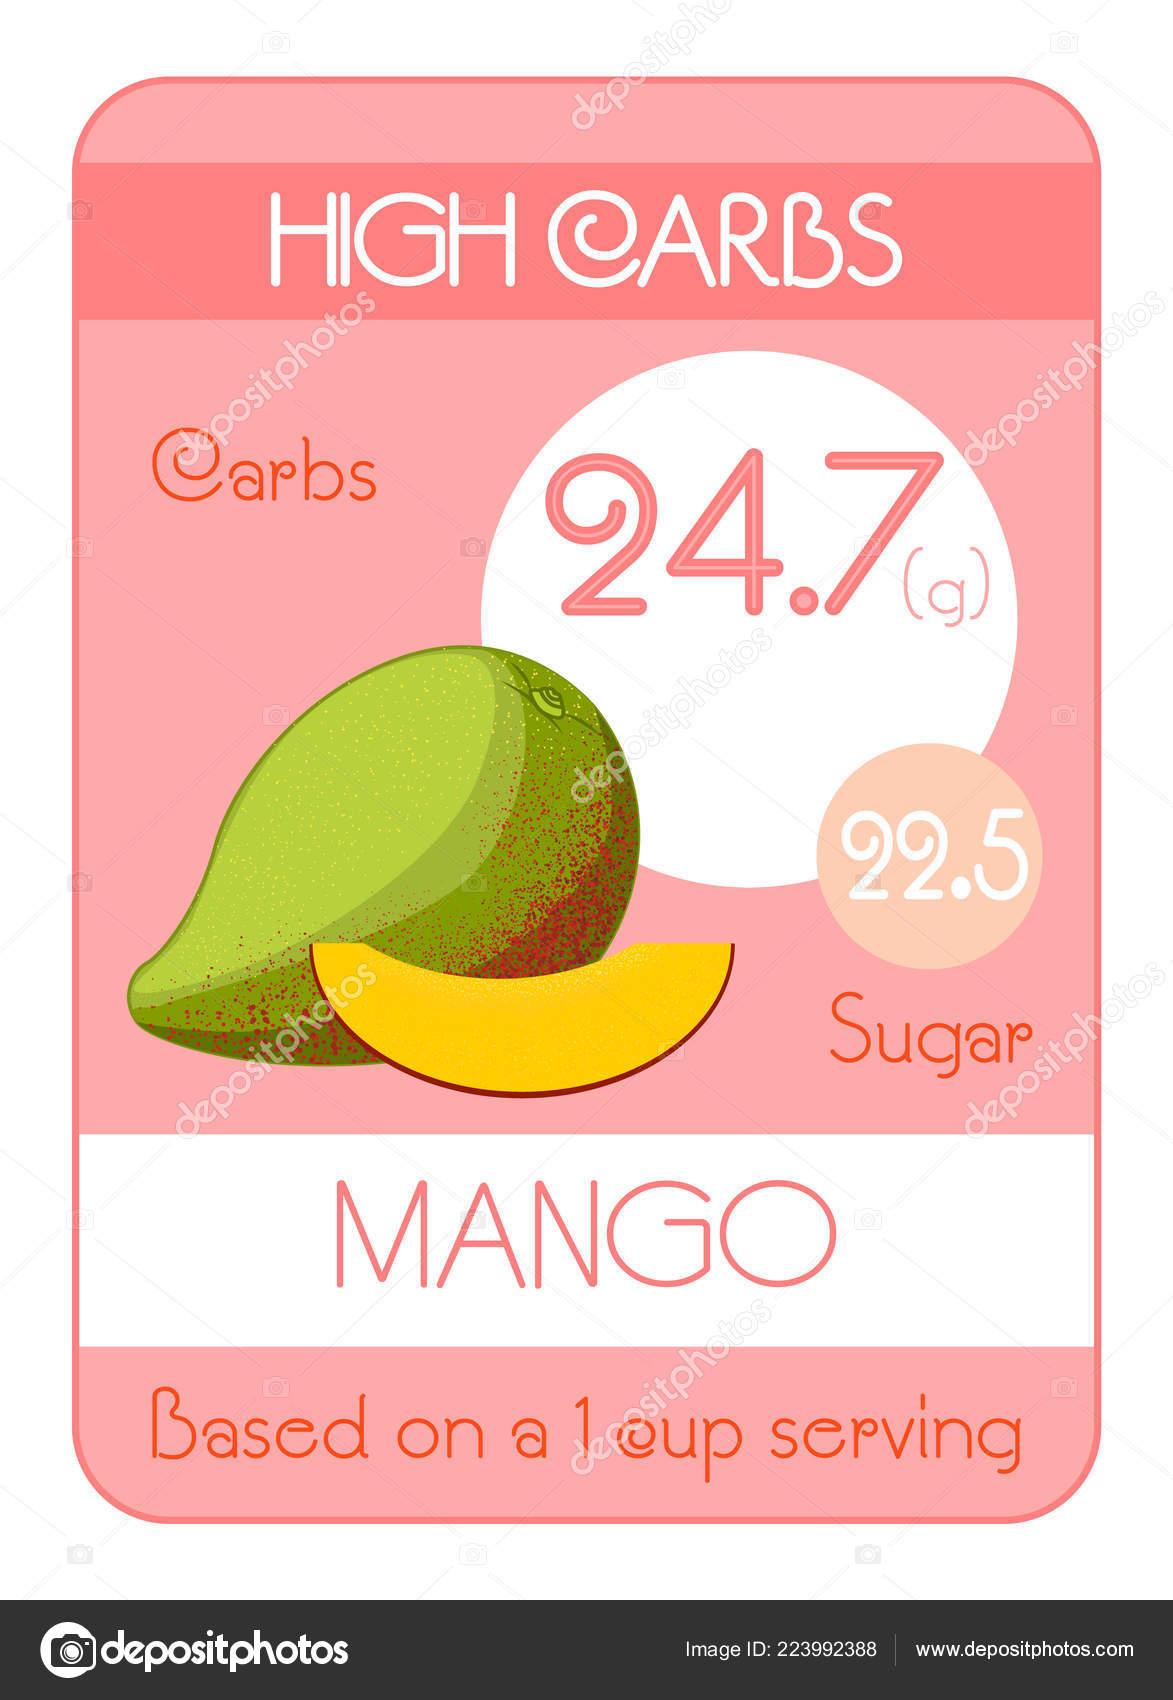 A Fruta Carambola Serve Para Que map carbohydrates sugar fruits high level mango information